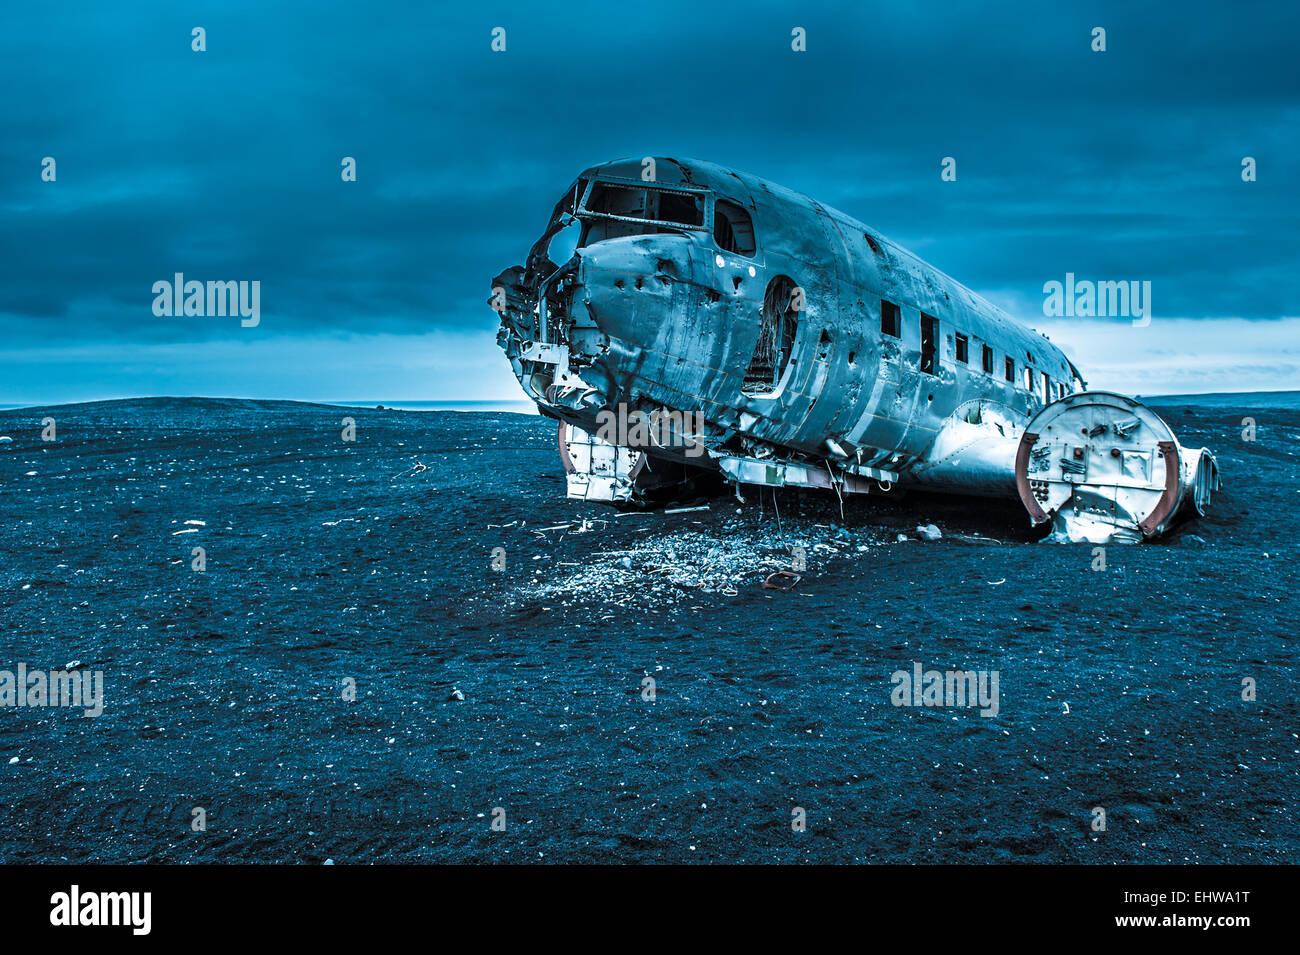 Dakota plane wreckage, Iceland - Stock Image